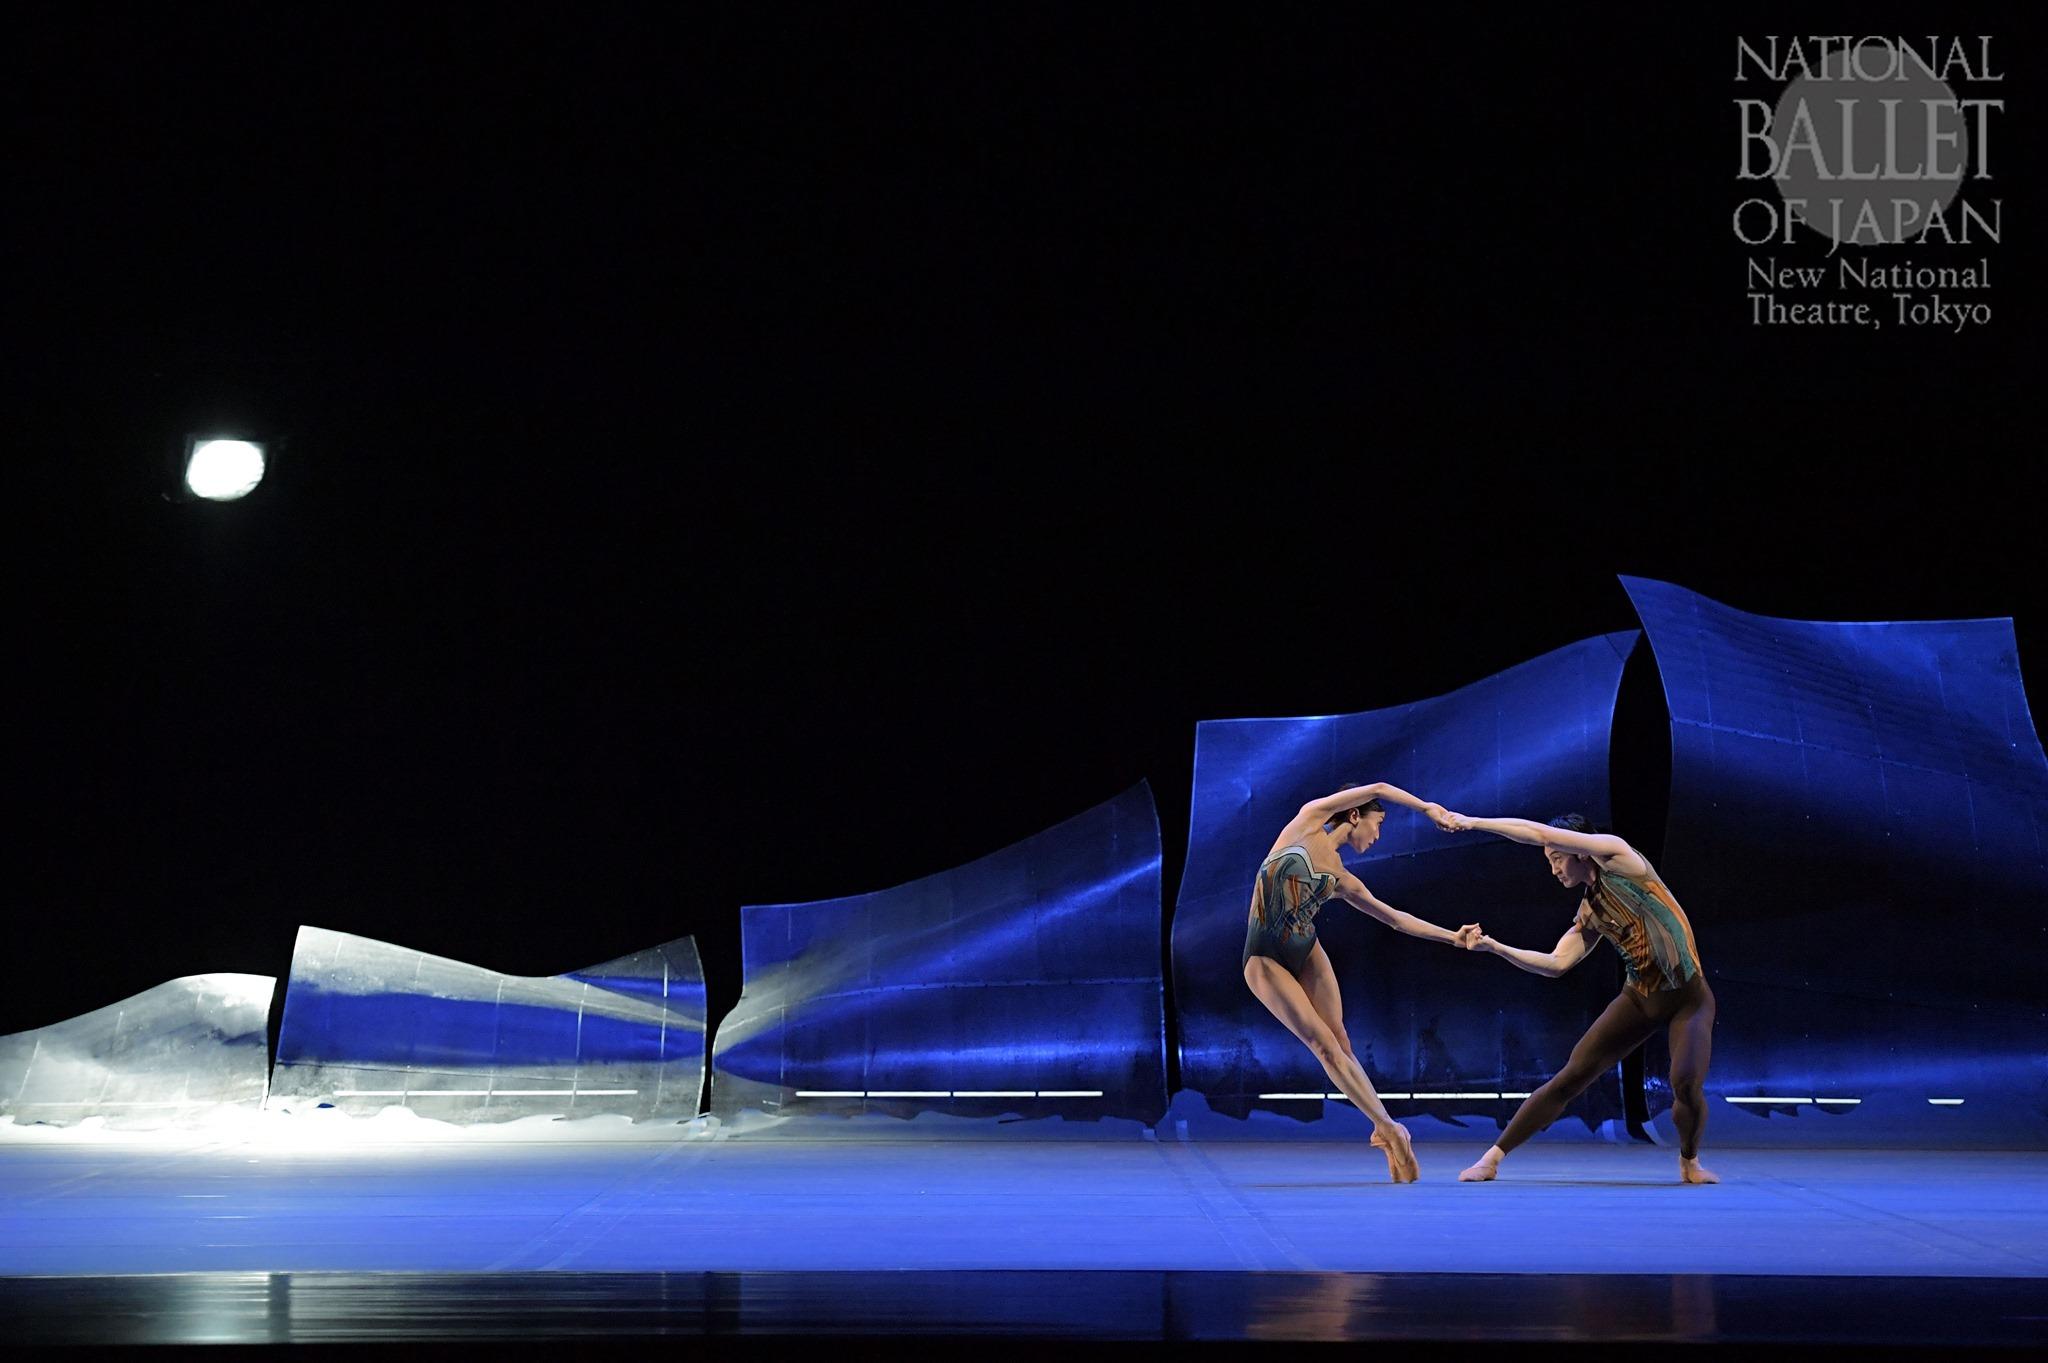 『DGV Danse à Grande Vitesse ©』米沢唯、渡邊峻郁(撮影:鹿摩隆司/写真提供:新国立劇場)